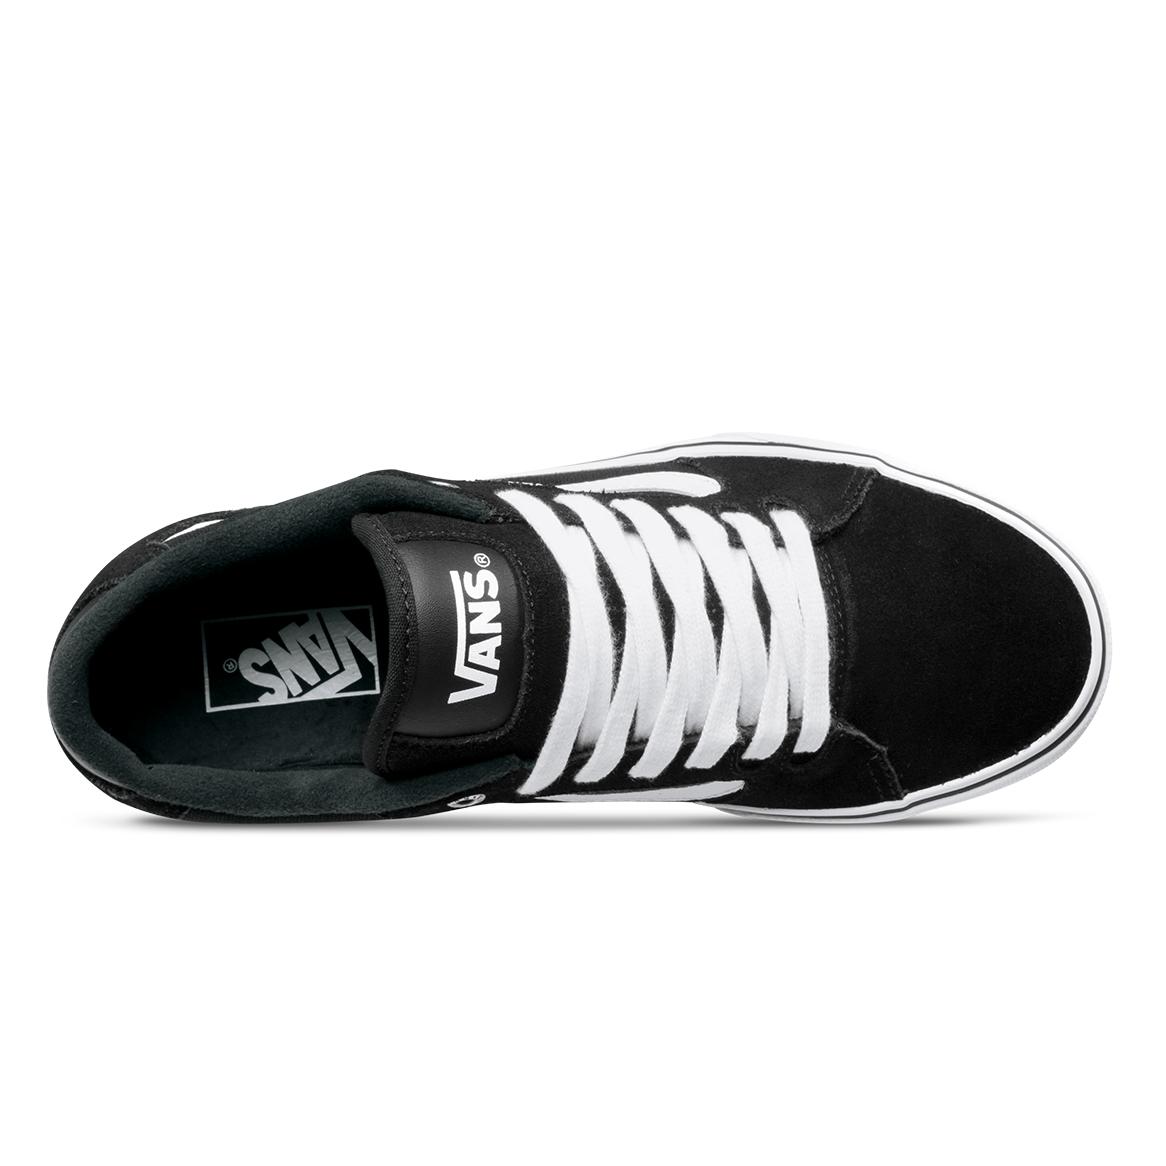 Vans/范斯 黑色运动鞋